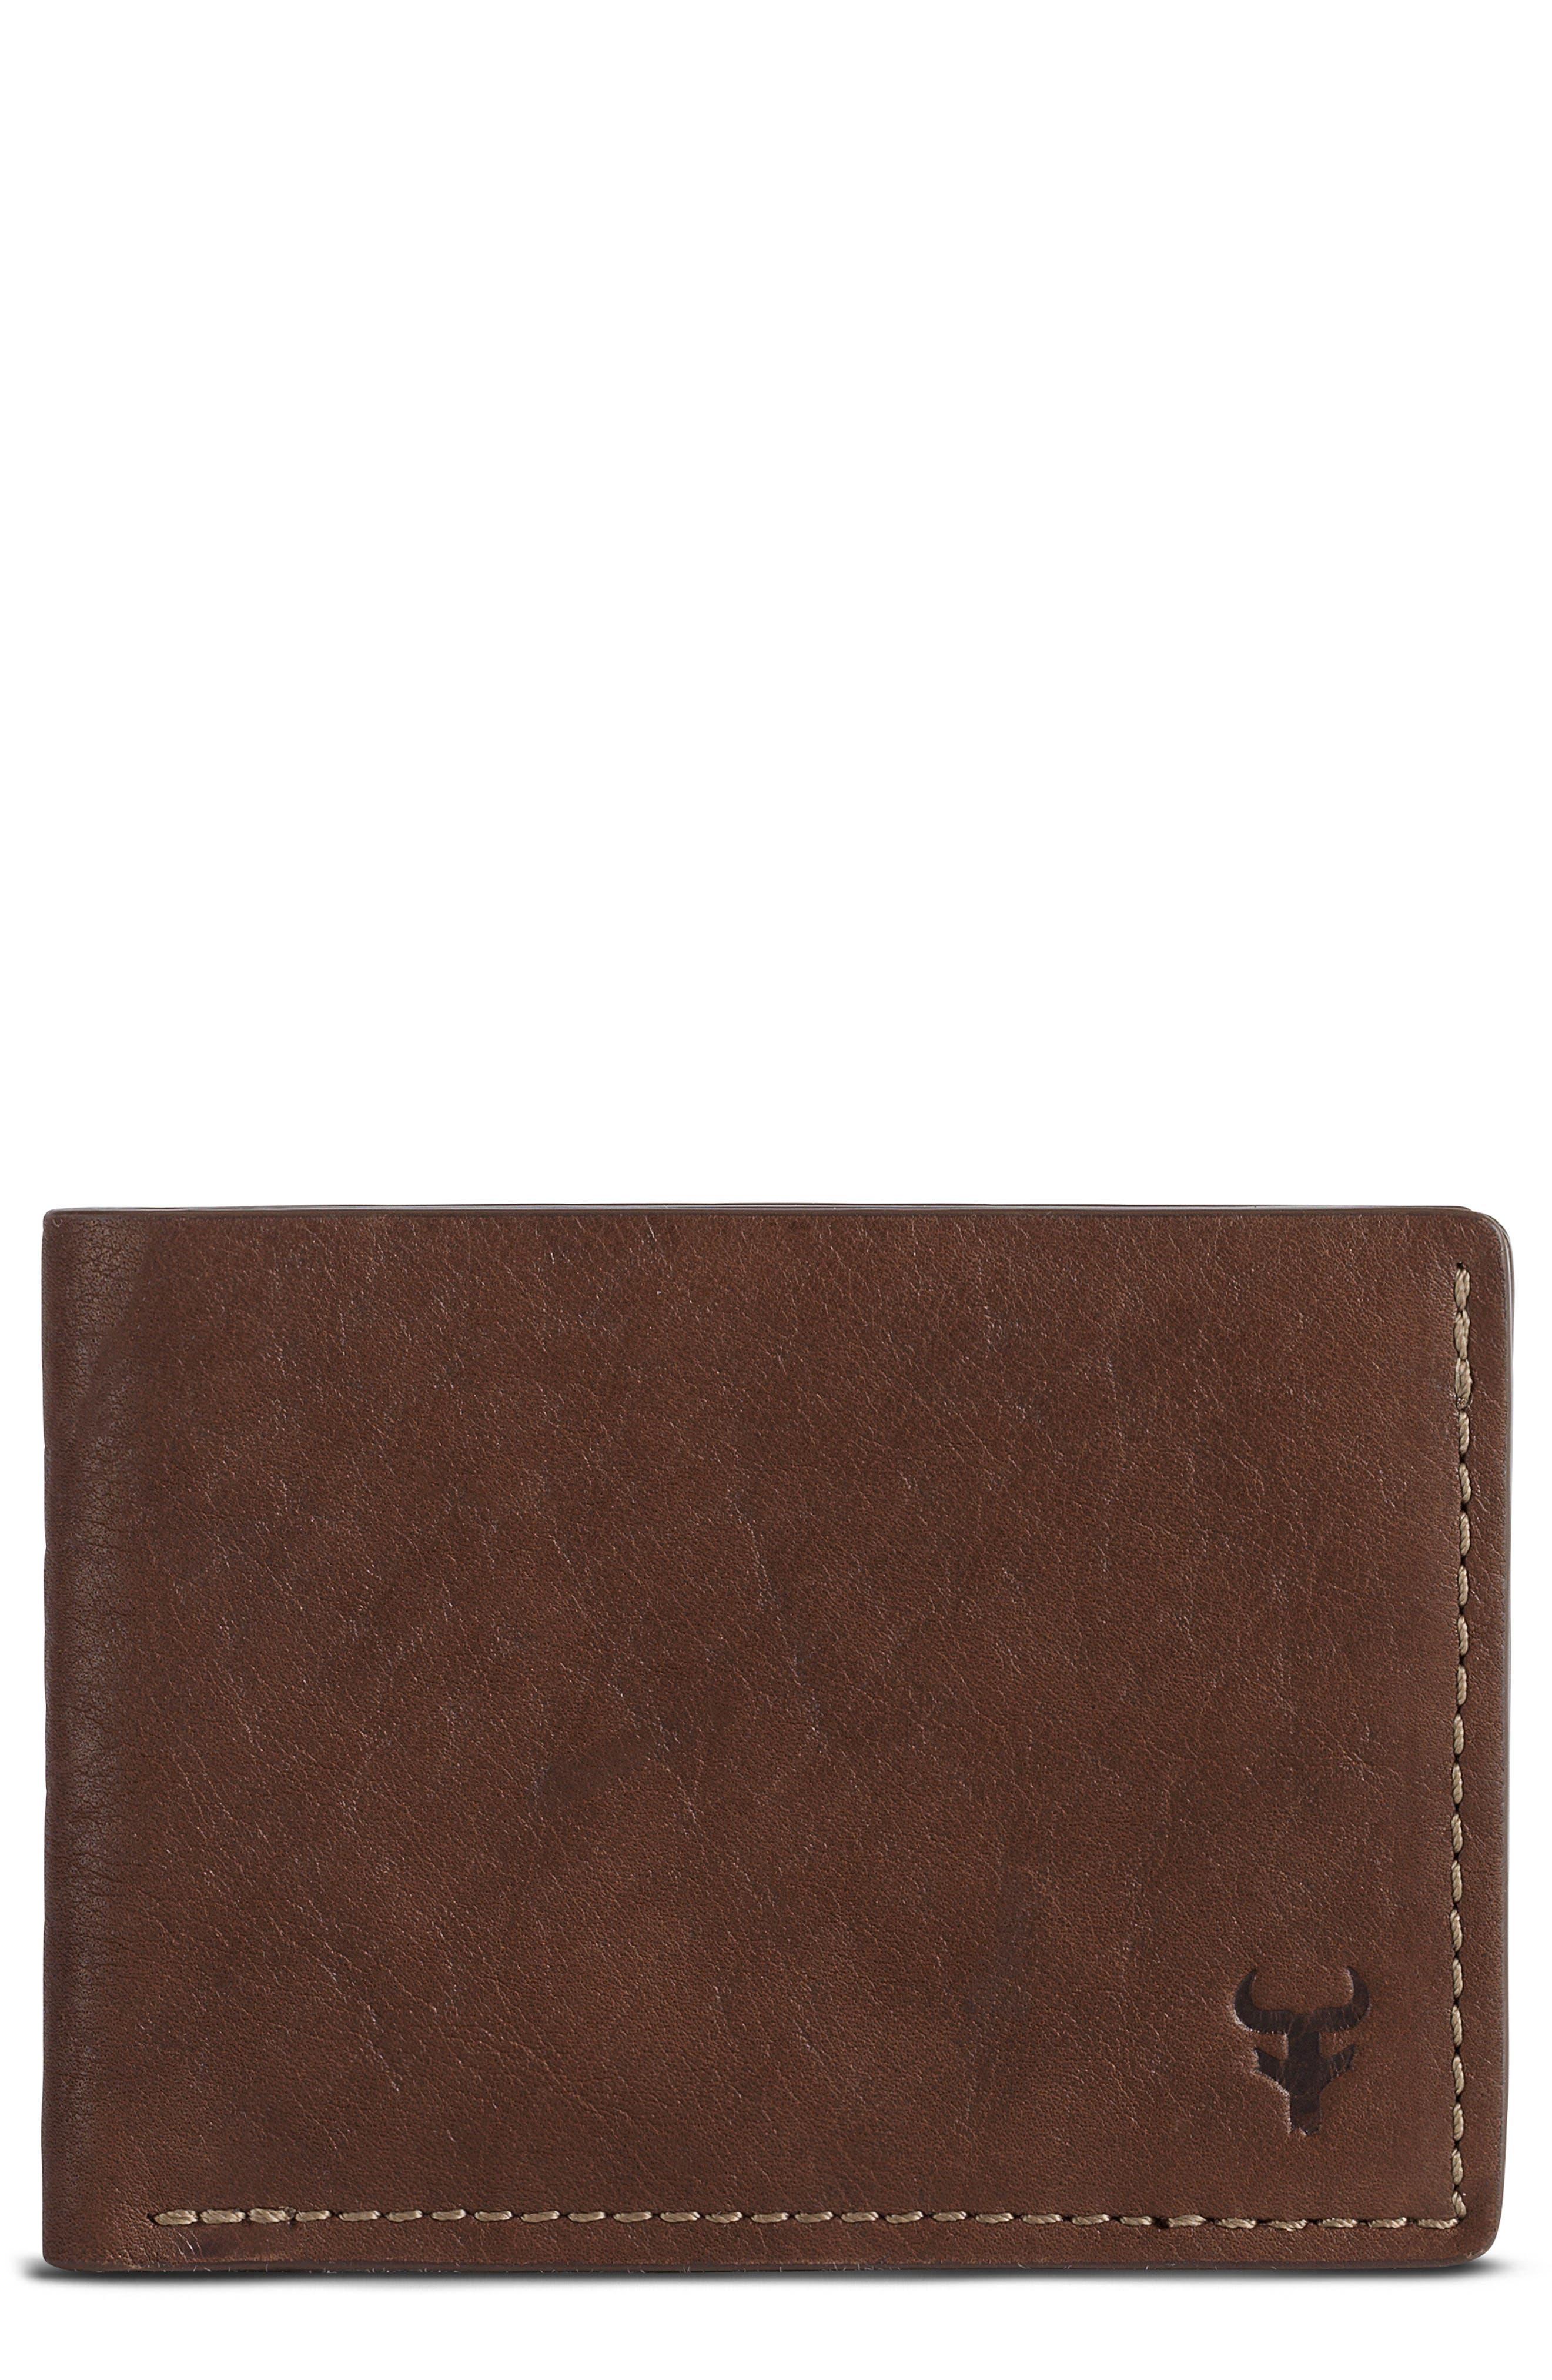 Jackson Super Slim Wallet,                         Main,                         color, 200